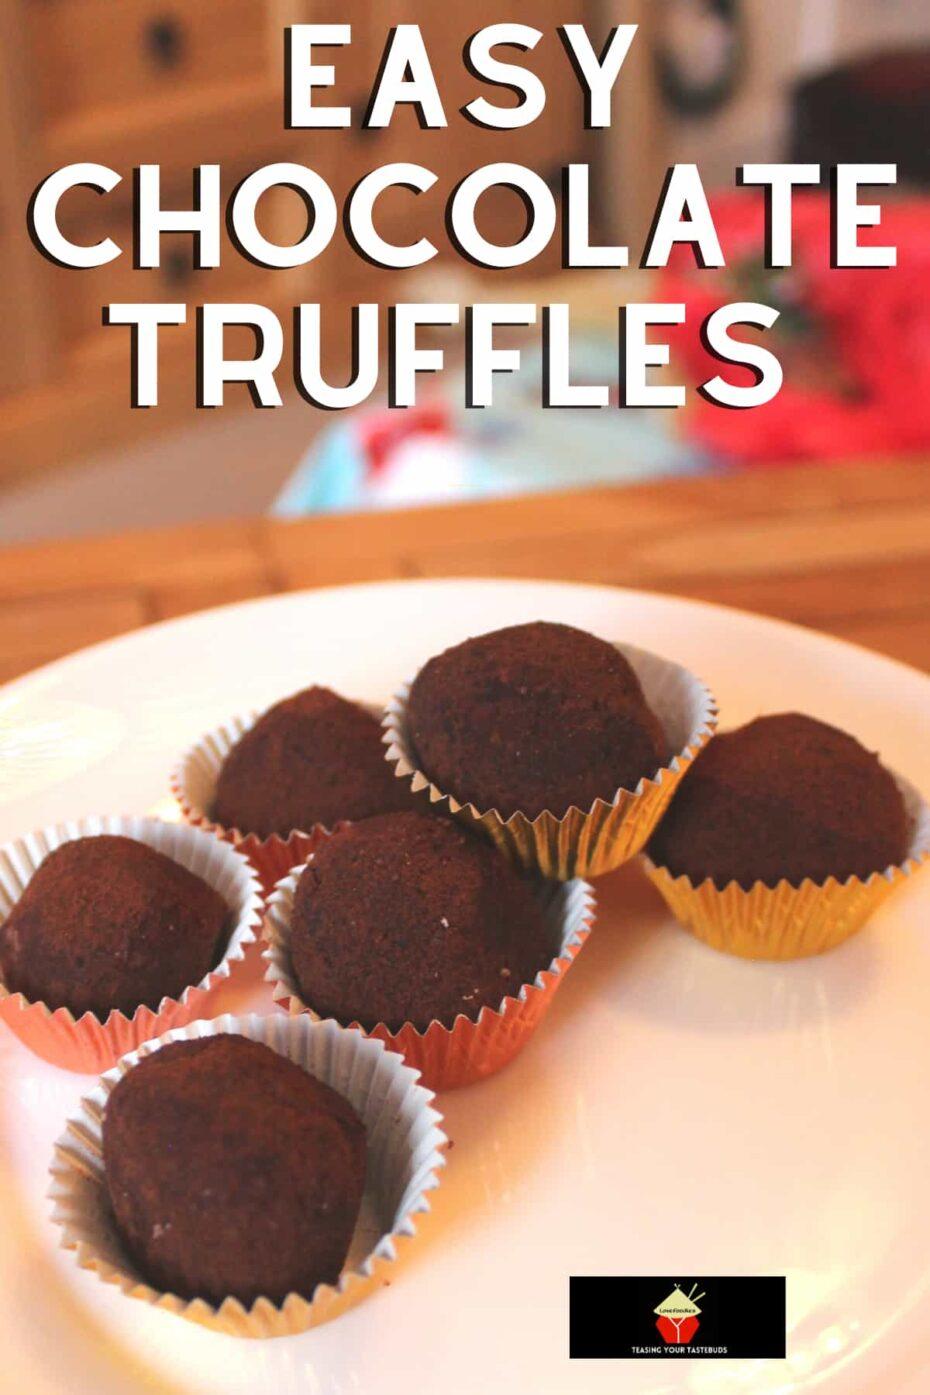 Easy Chocolate Truffles. Creamy, rich homemade chocolate truffles are easy to make and perfect for gifts.